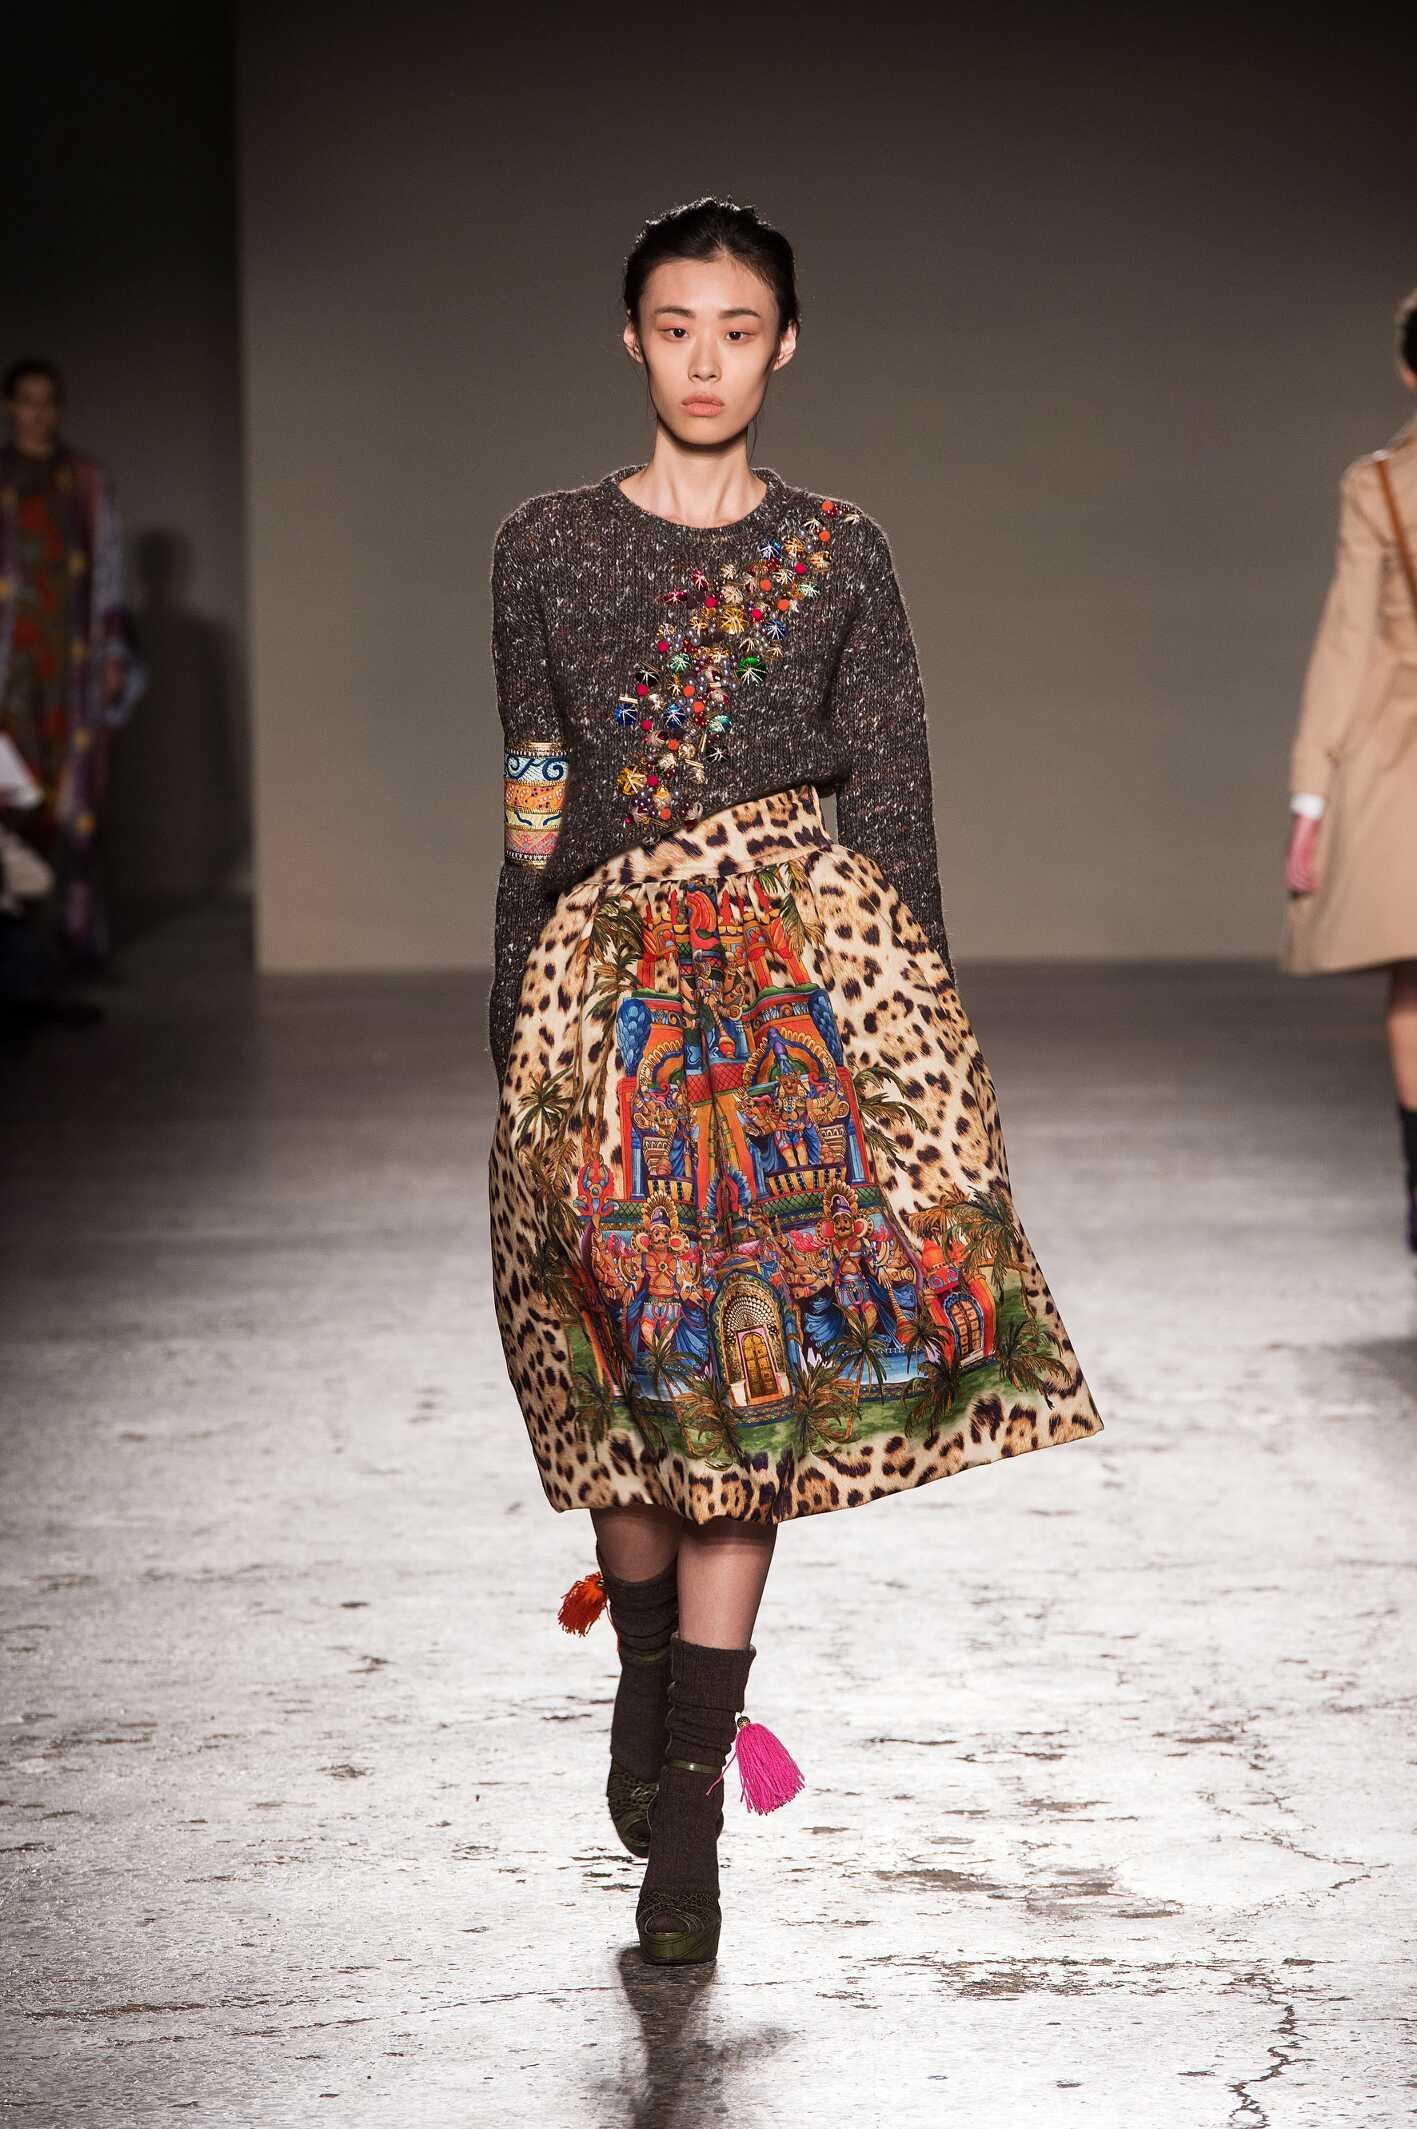 Catwalk Stella Jean Womenswear Collection Winter 2015